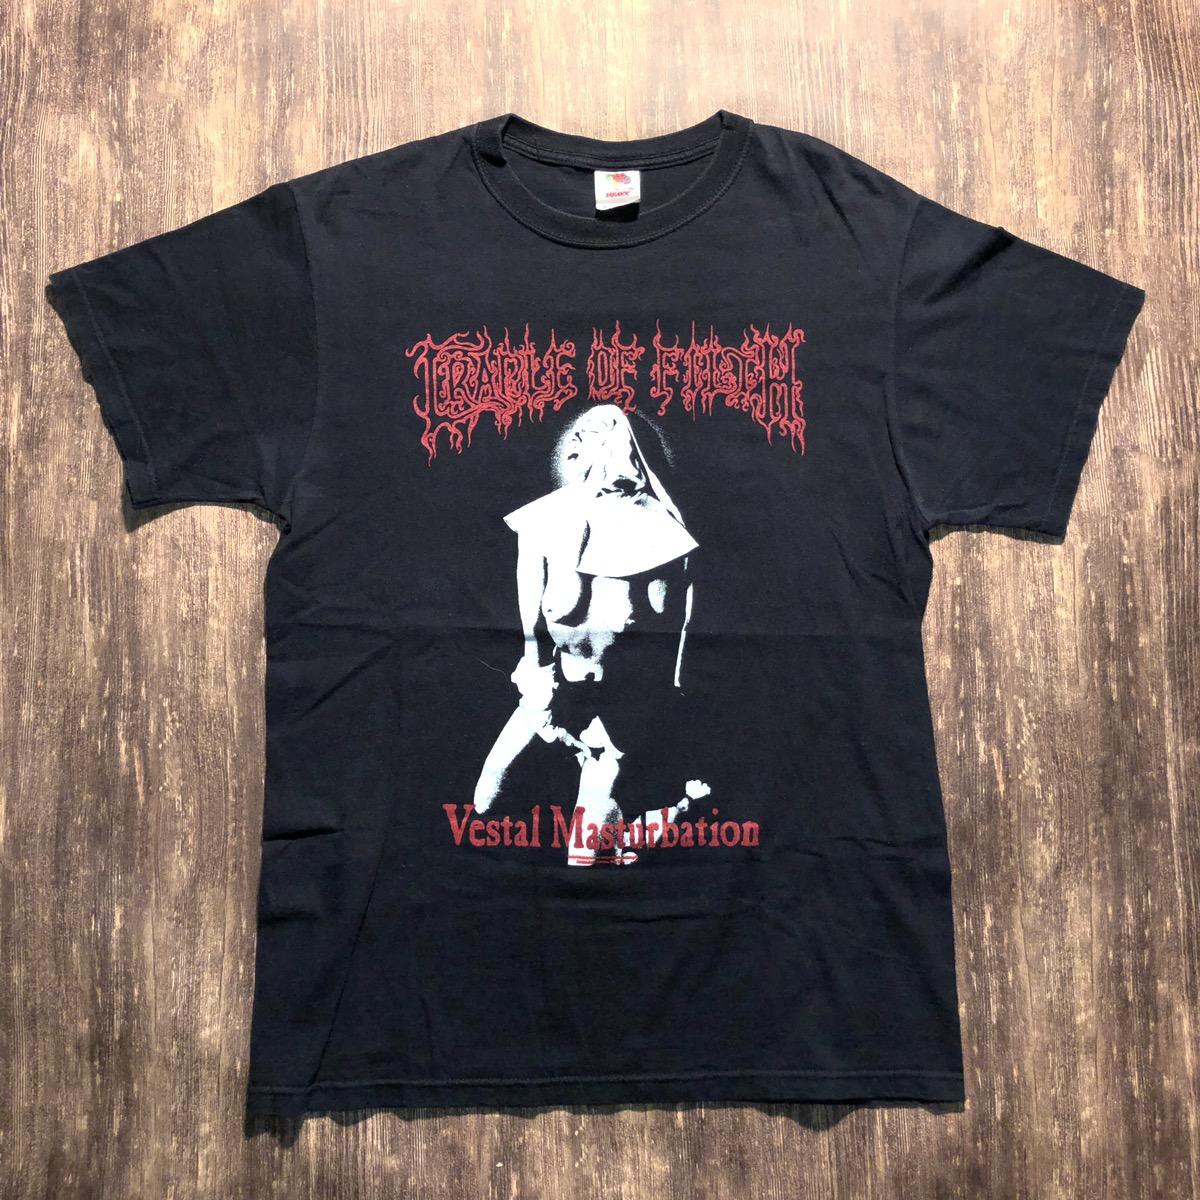 Amazing Rare Cradle Of Filth Vestal masturbation vintage 1990/'s shirt  unisex size medium